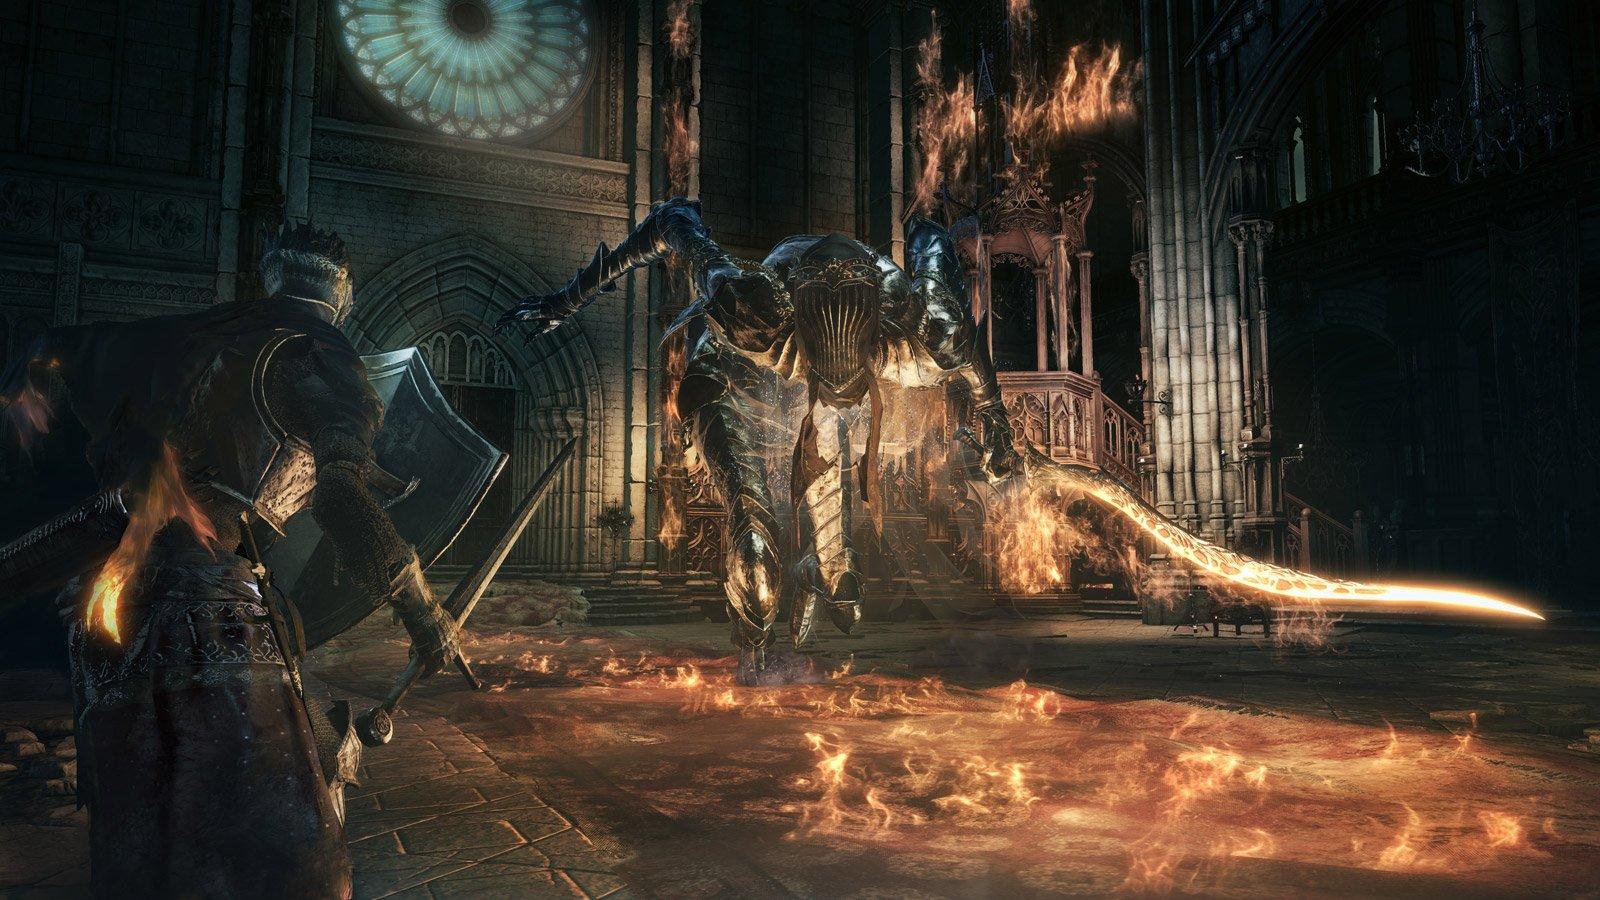 dark souls 3 beta stress test review preview превью ревью обзор дата выхода скачать dancer of the frigid valley boss